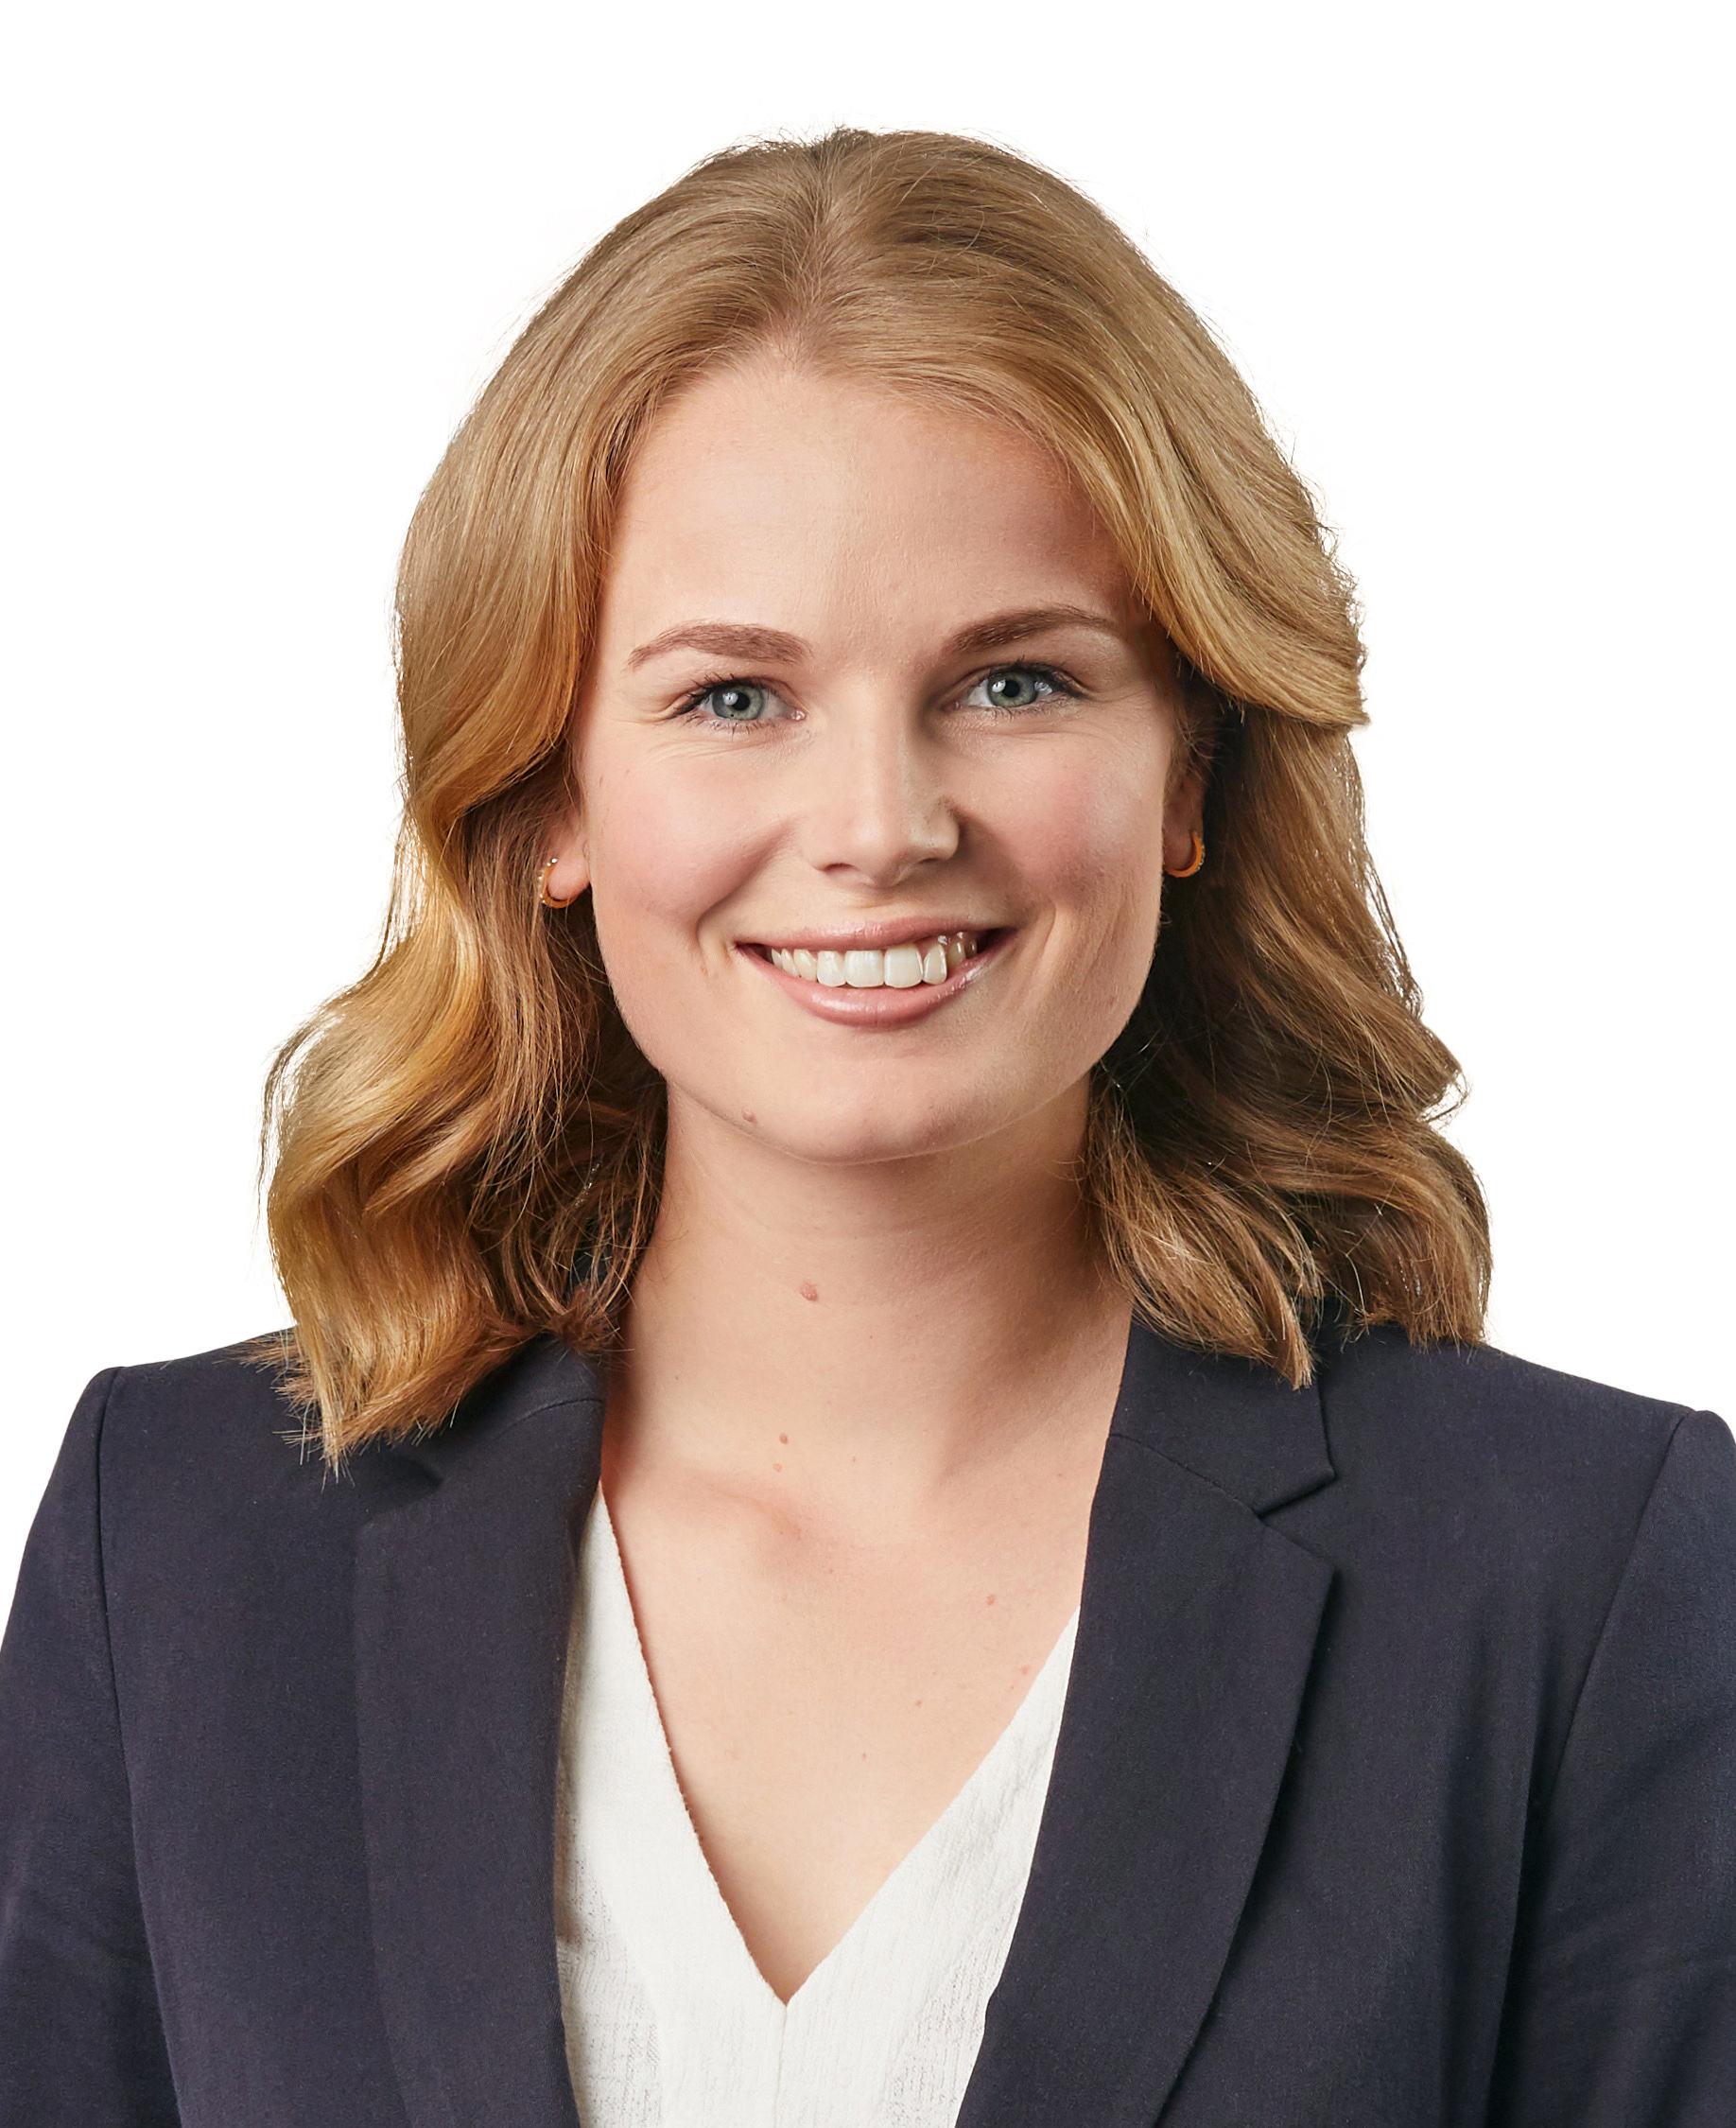 Sarah Eastmond